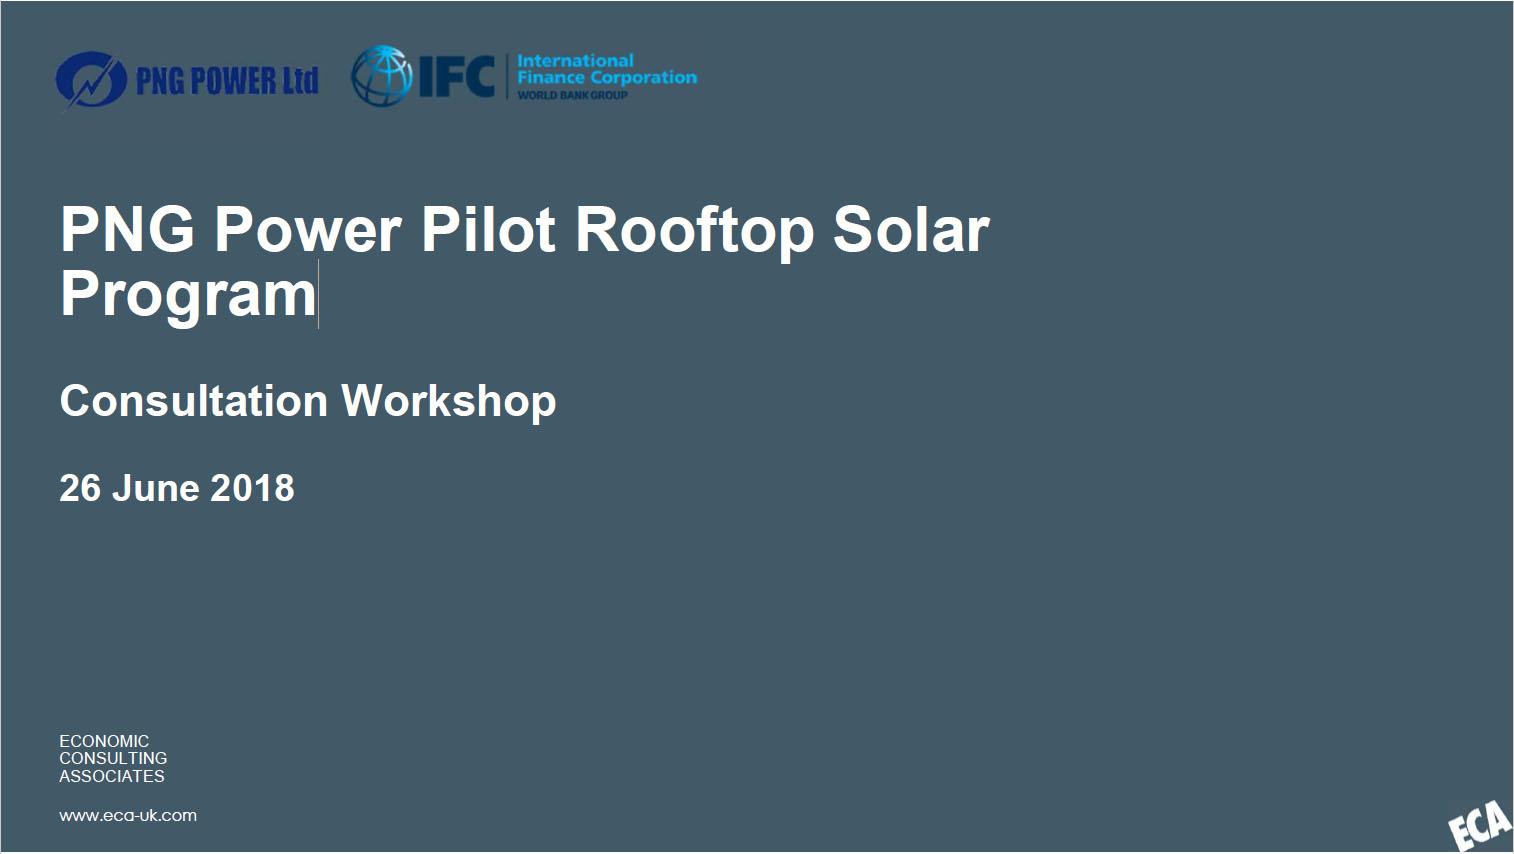 PNG Power Pilot Rooftop Solar Program